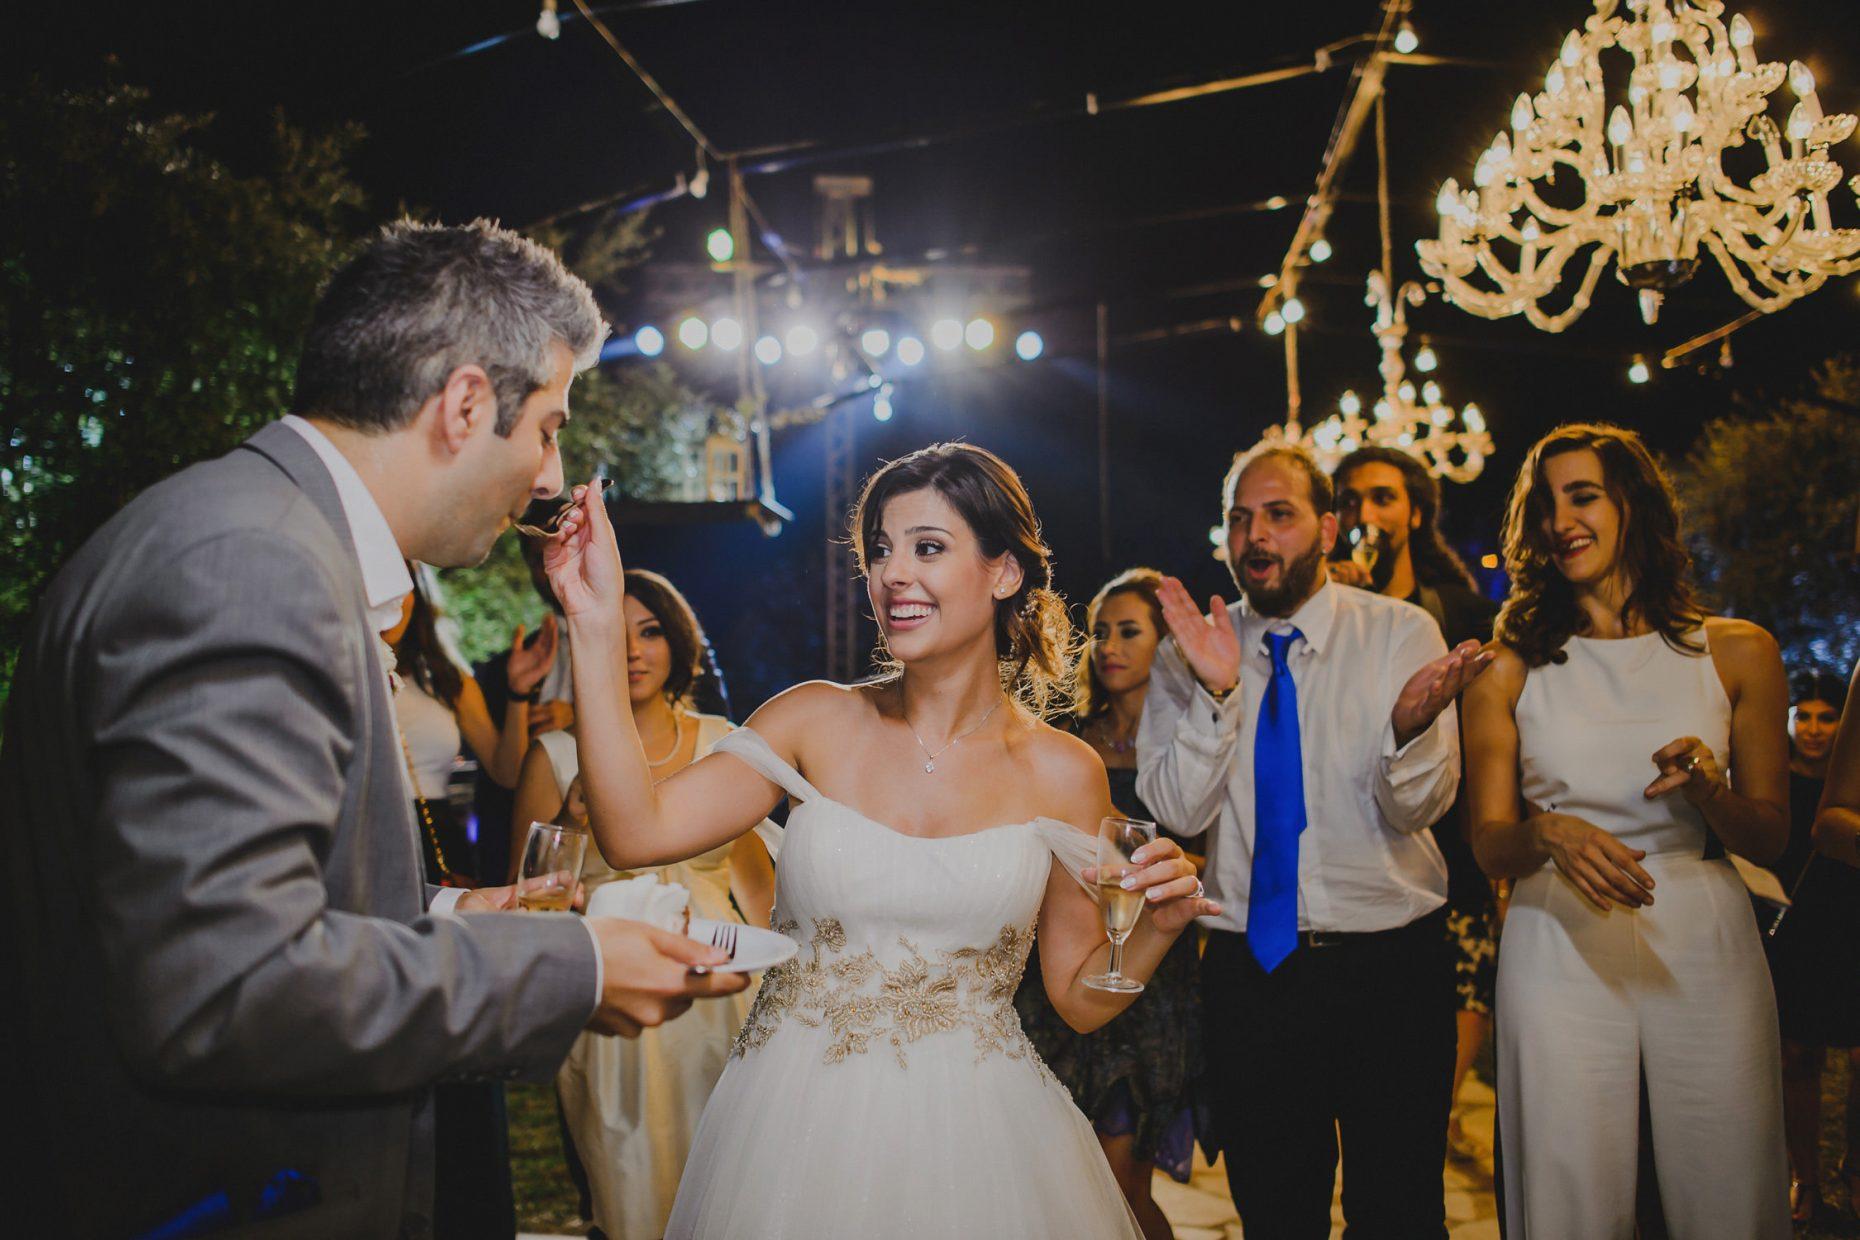 tahit venue lebanon wedding photographer